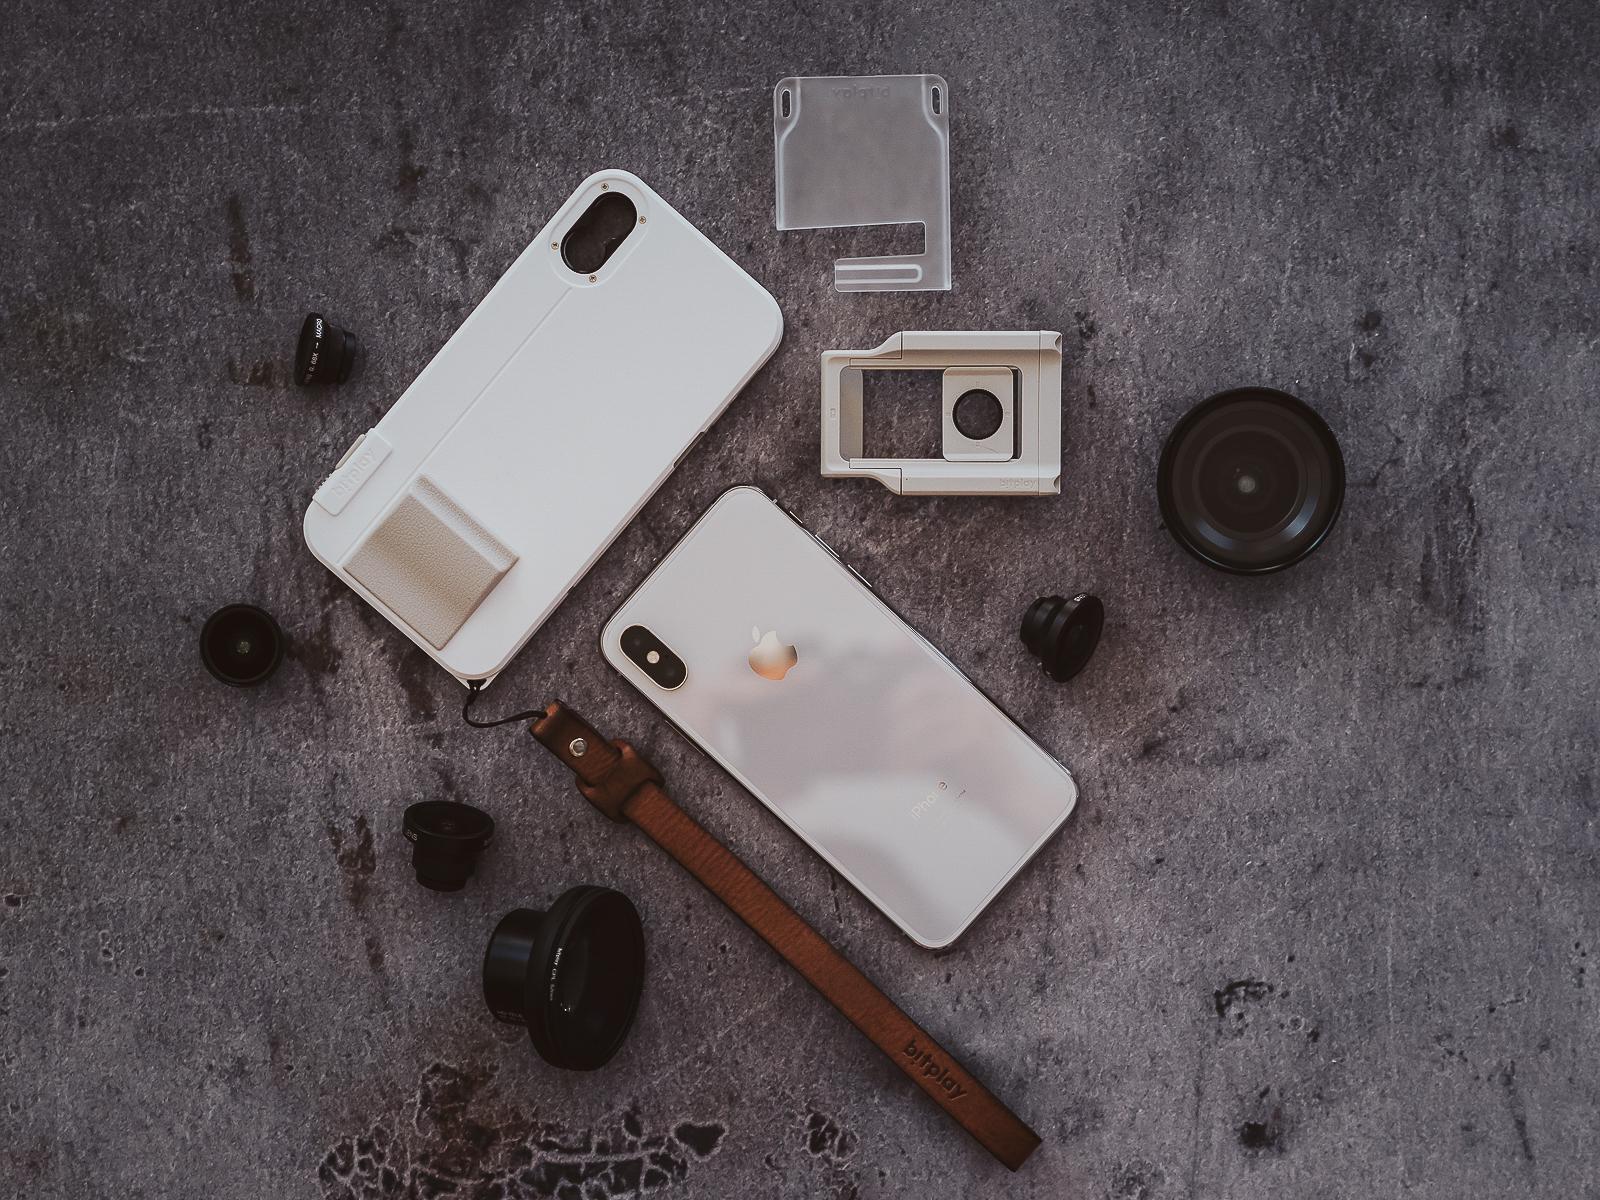 bitplay AllClip & iPhoneX + Samsung Galaxy Note9 - Olympus EM1Markii4518 - Yes! Please Enjoy-16.jpg